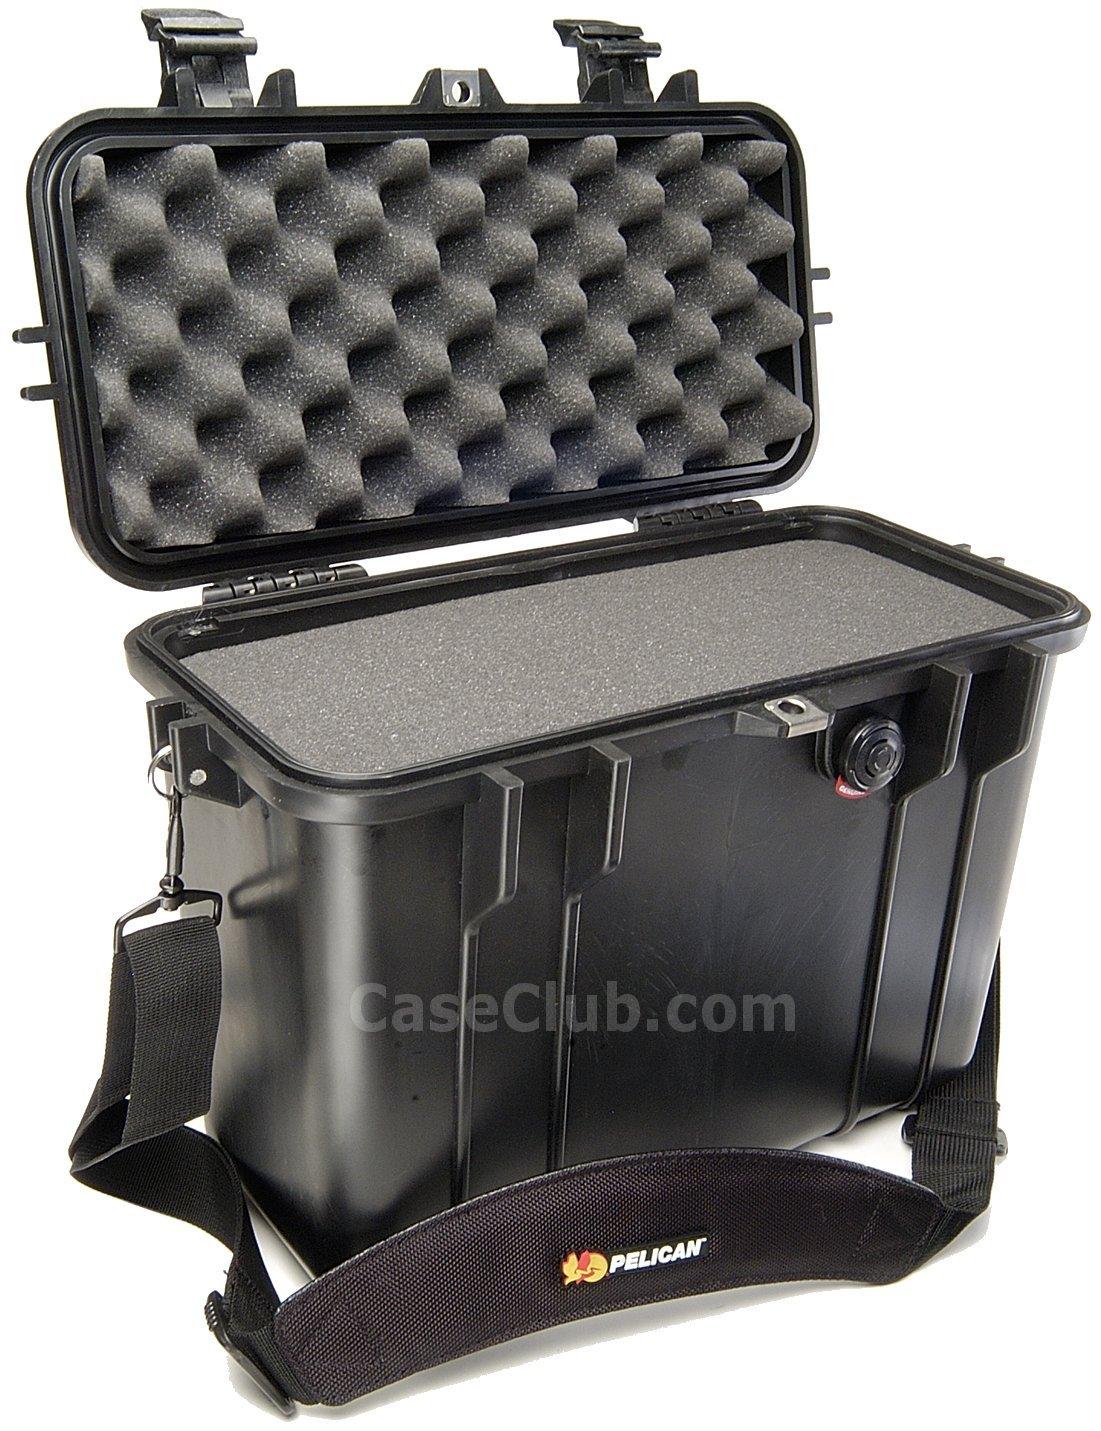 Pelican™ 1430 Case